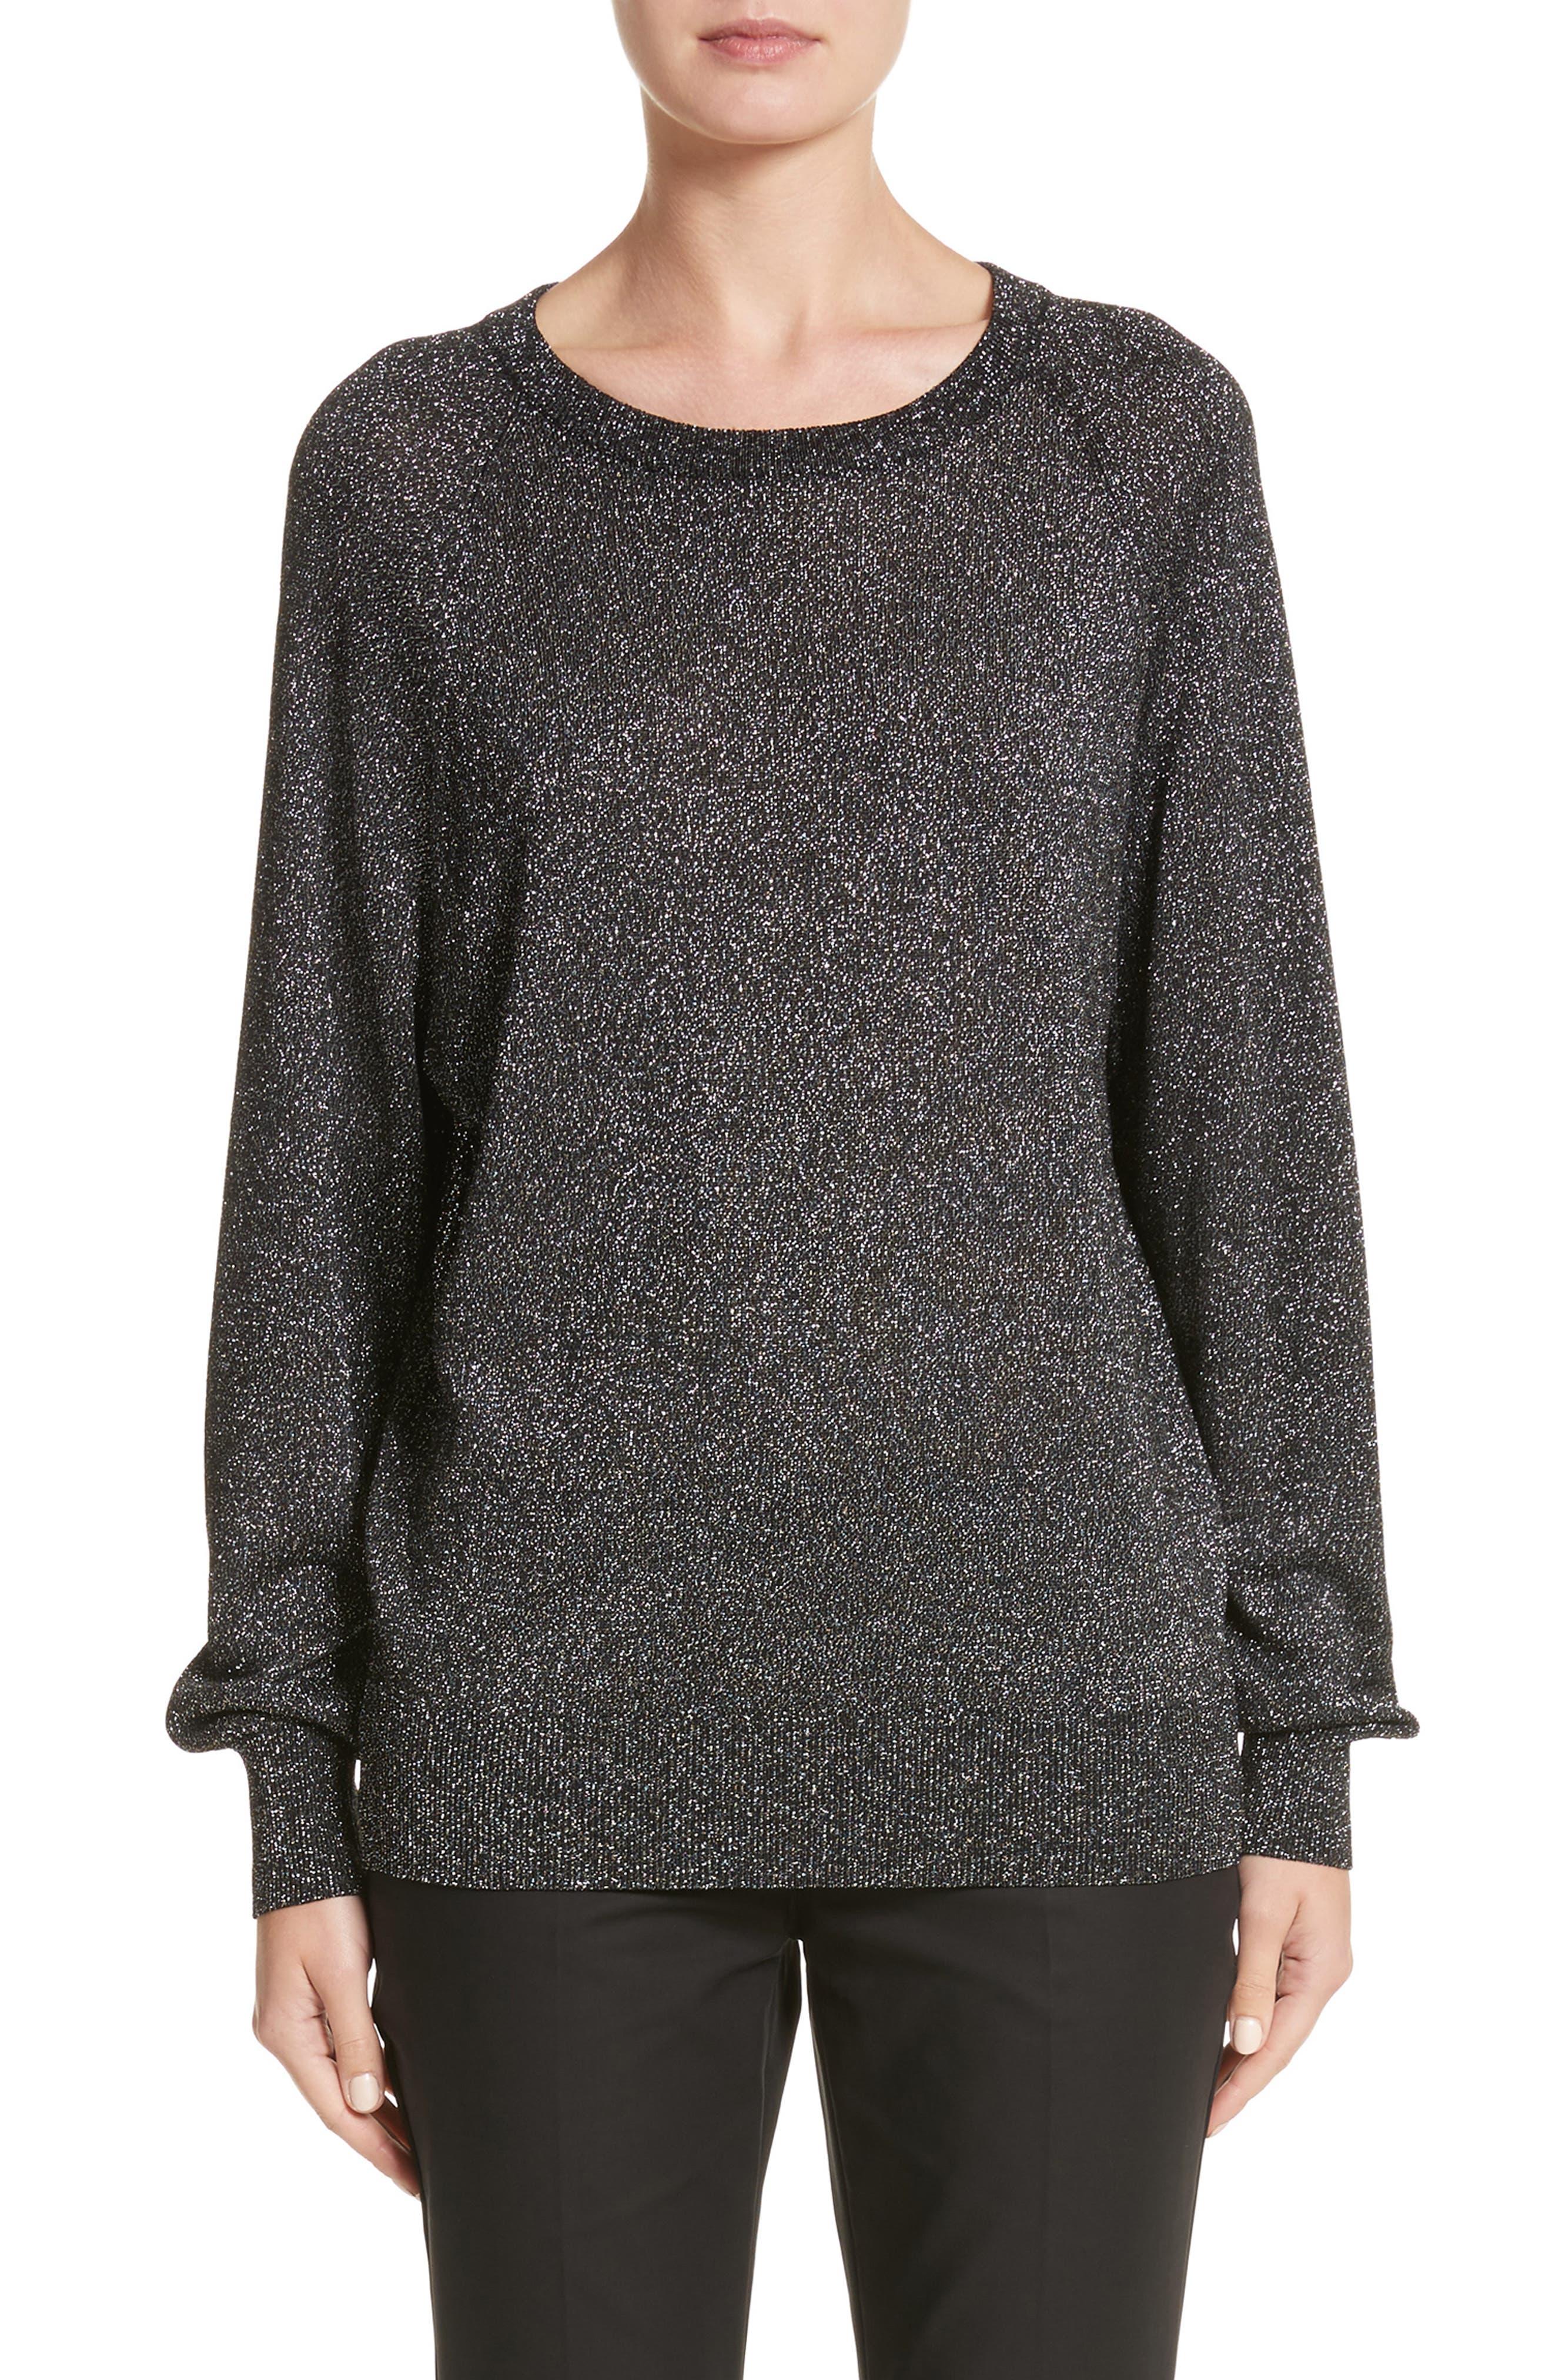 Michael Kors Metallic Knit Raglan Pullover